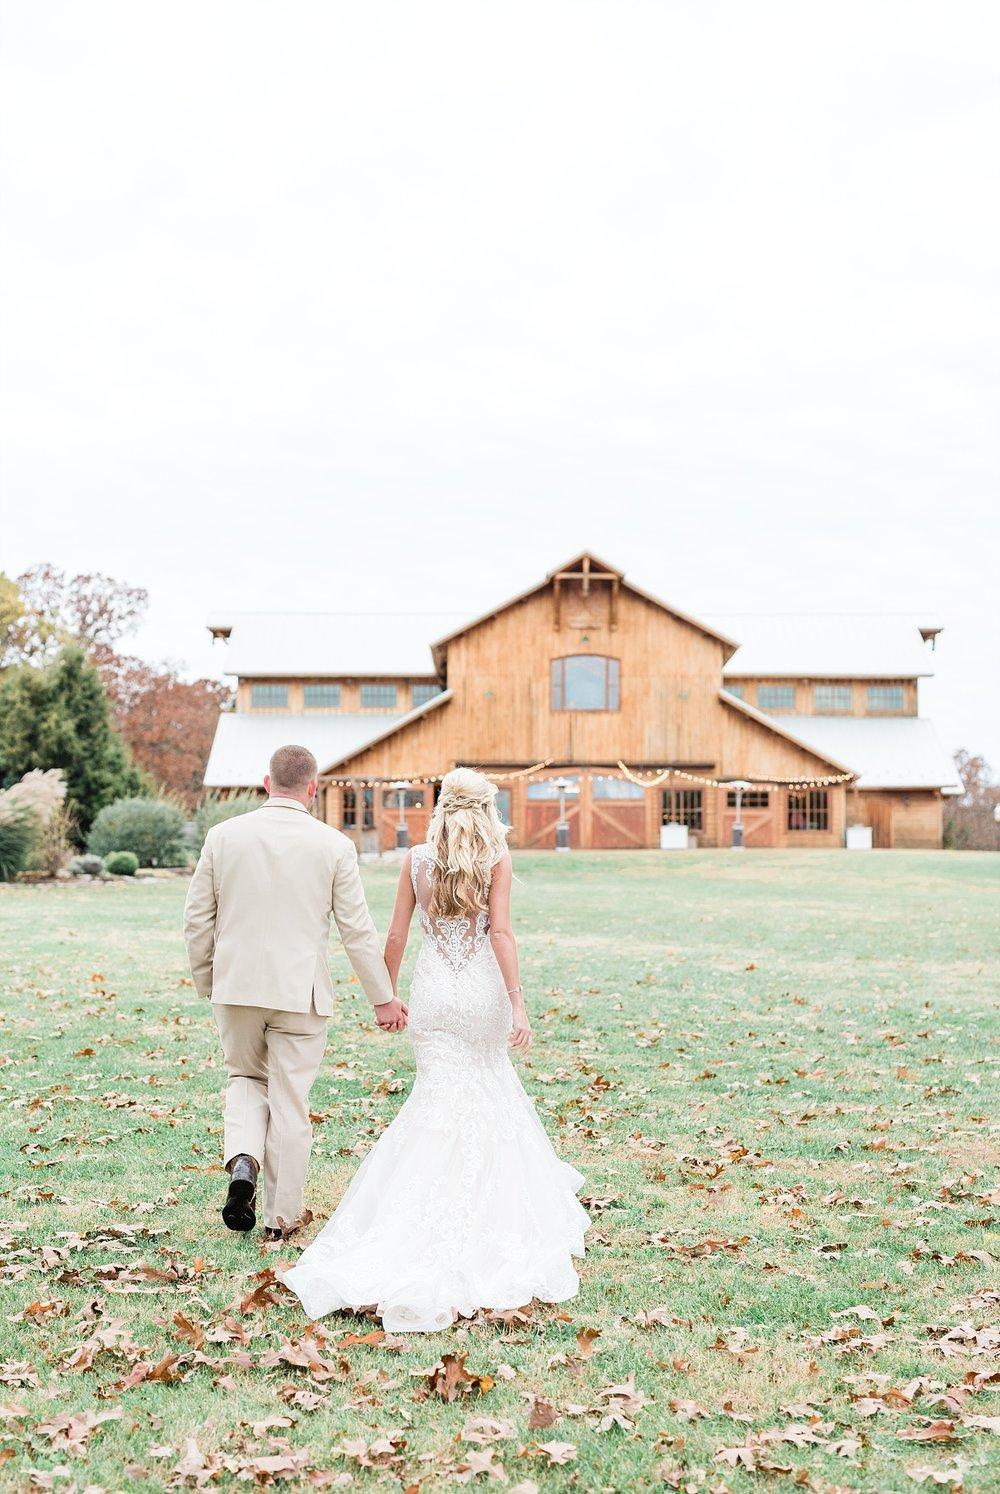 Lakeside Wedding in Fall at Mighty Oak Lodge by Misouri Wedding Photographer Kelsi Kliethermes Photography_0037.jpg